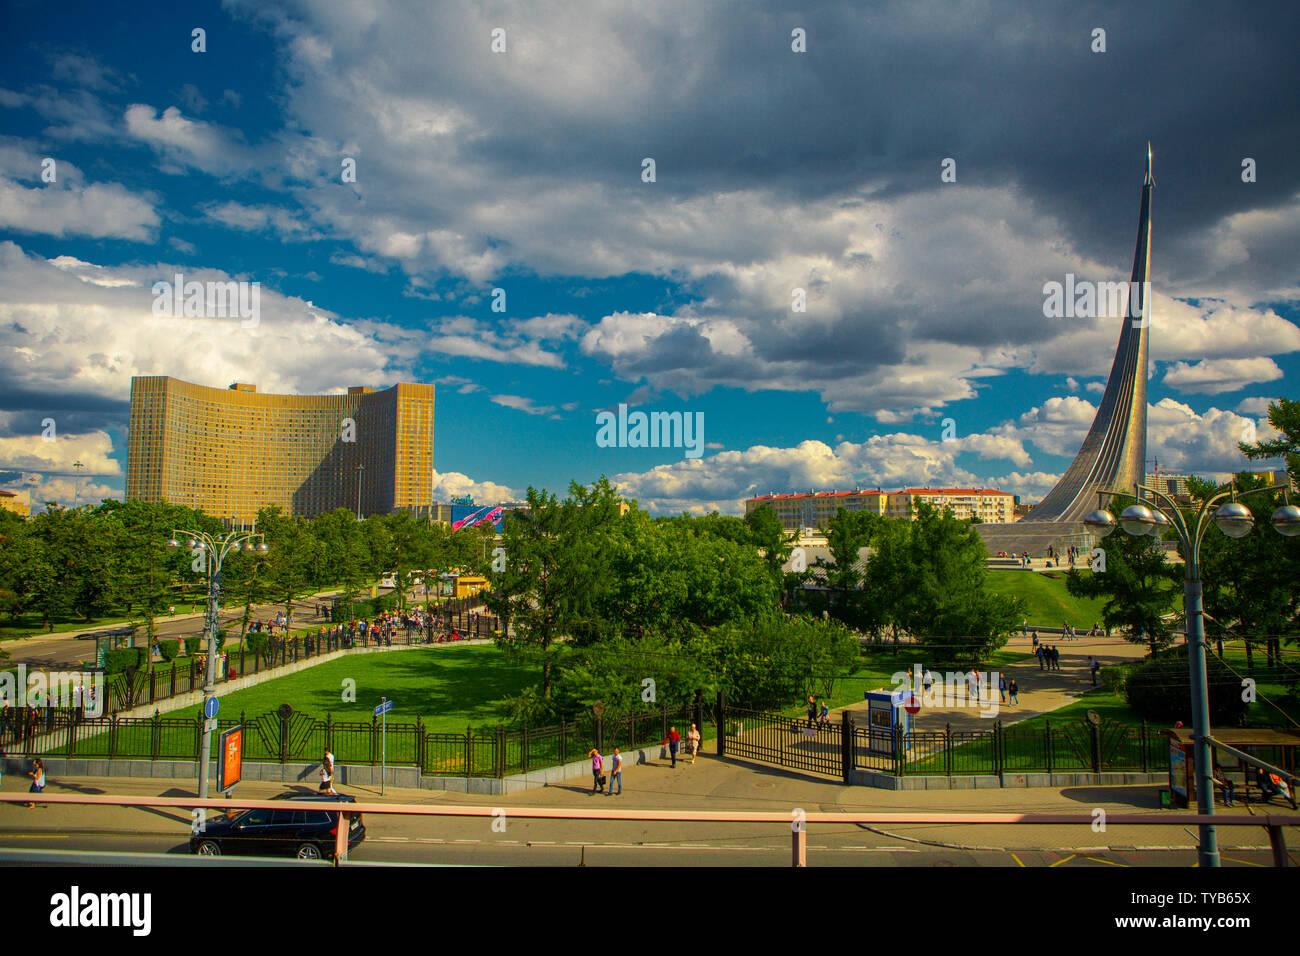 Hotel 'Cosmos'. Metro VDNH. Moscow - Stock Image